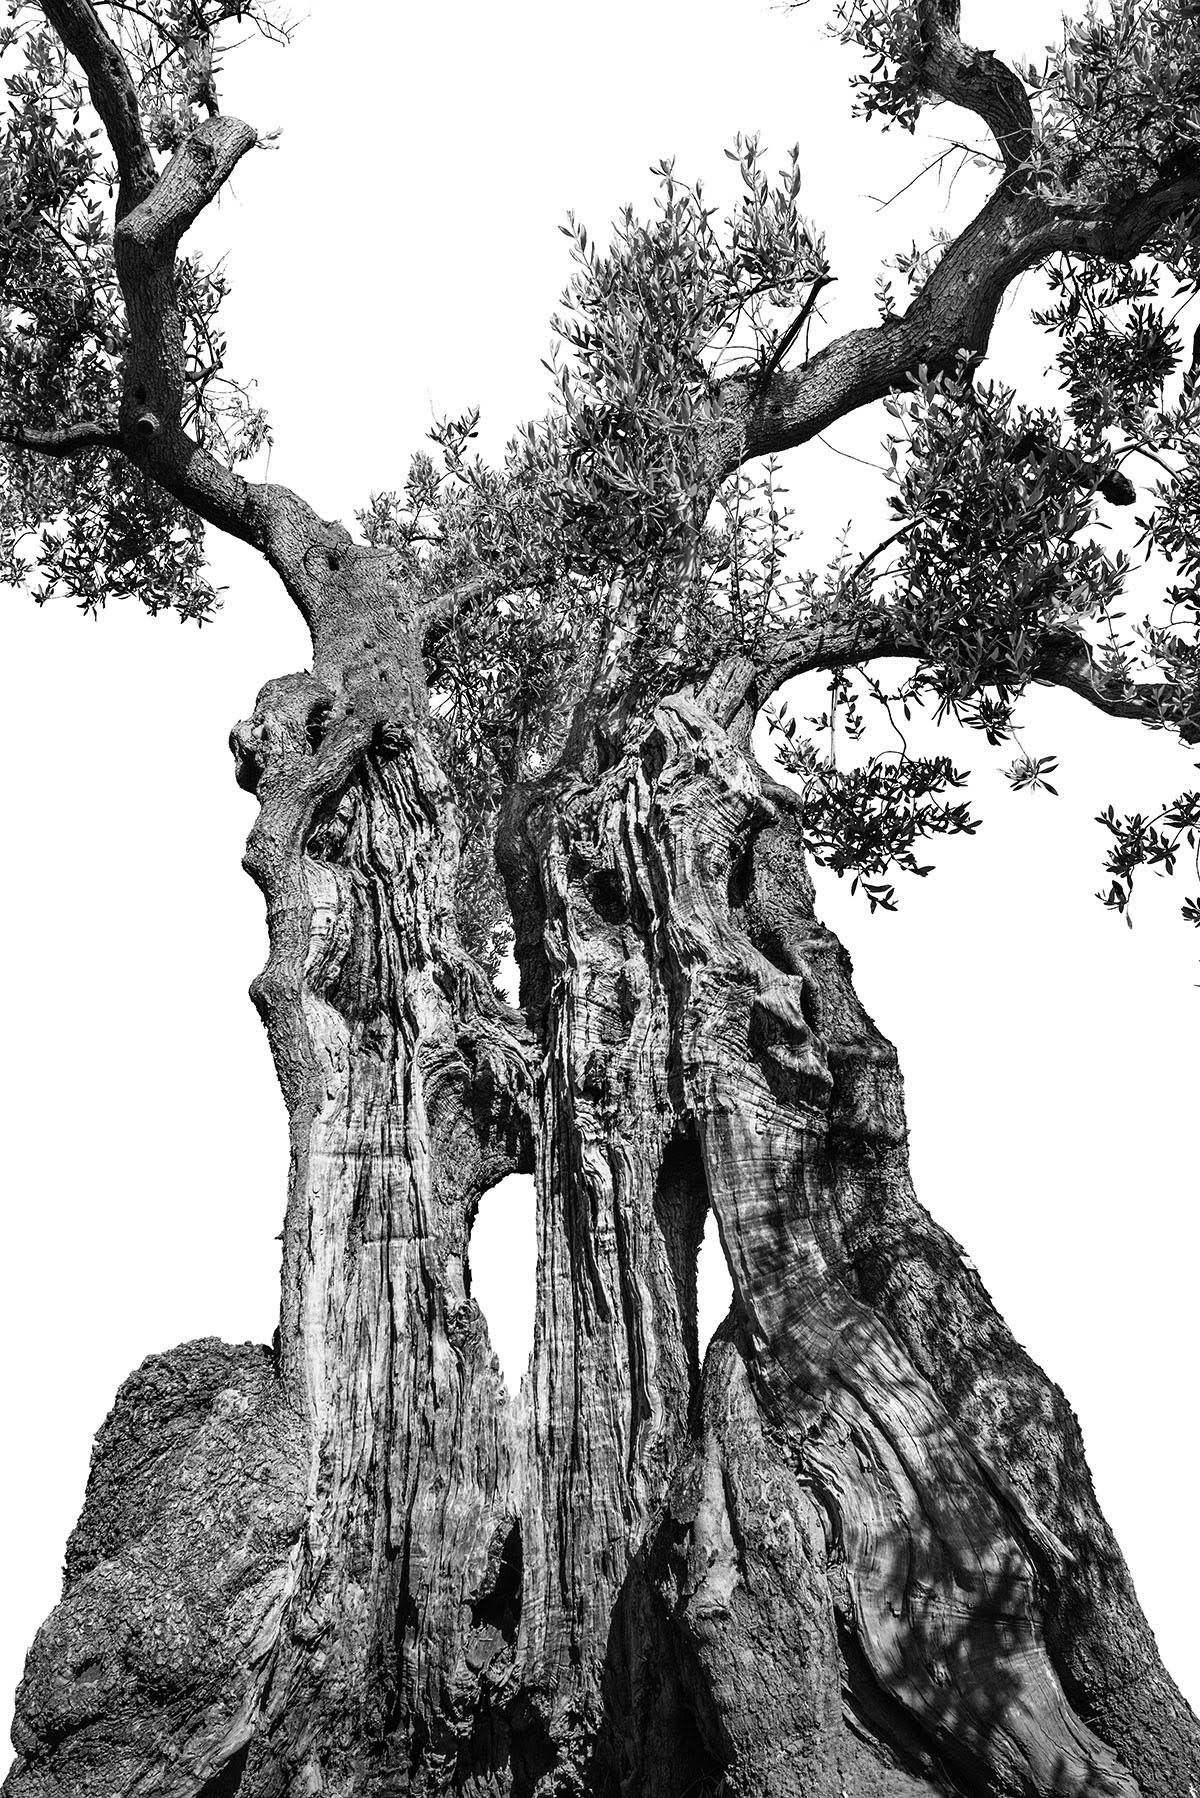 martin-ogolter-Monumentali-nature-landscape-photographer-01